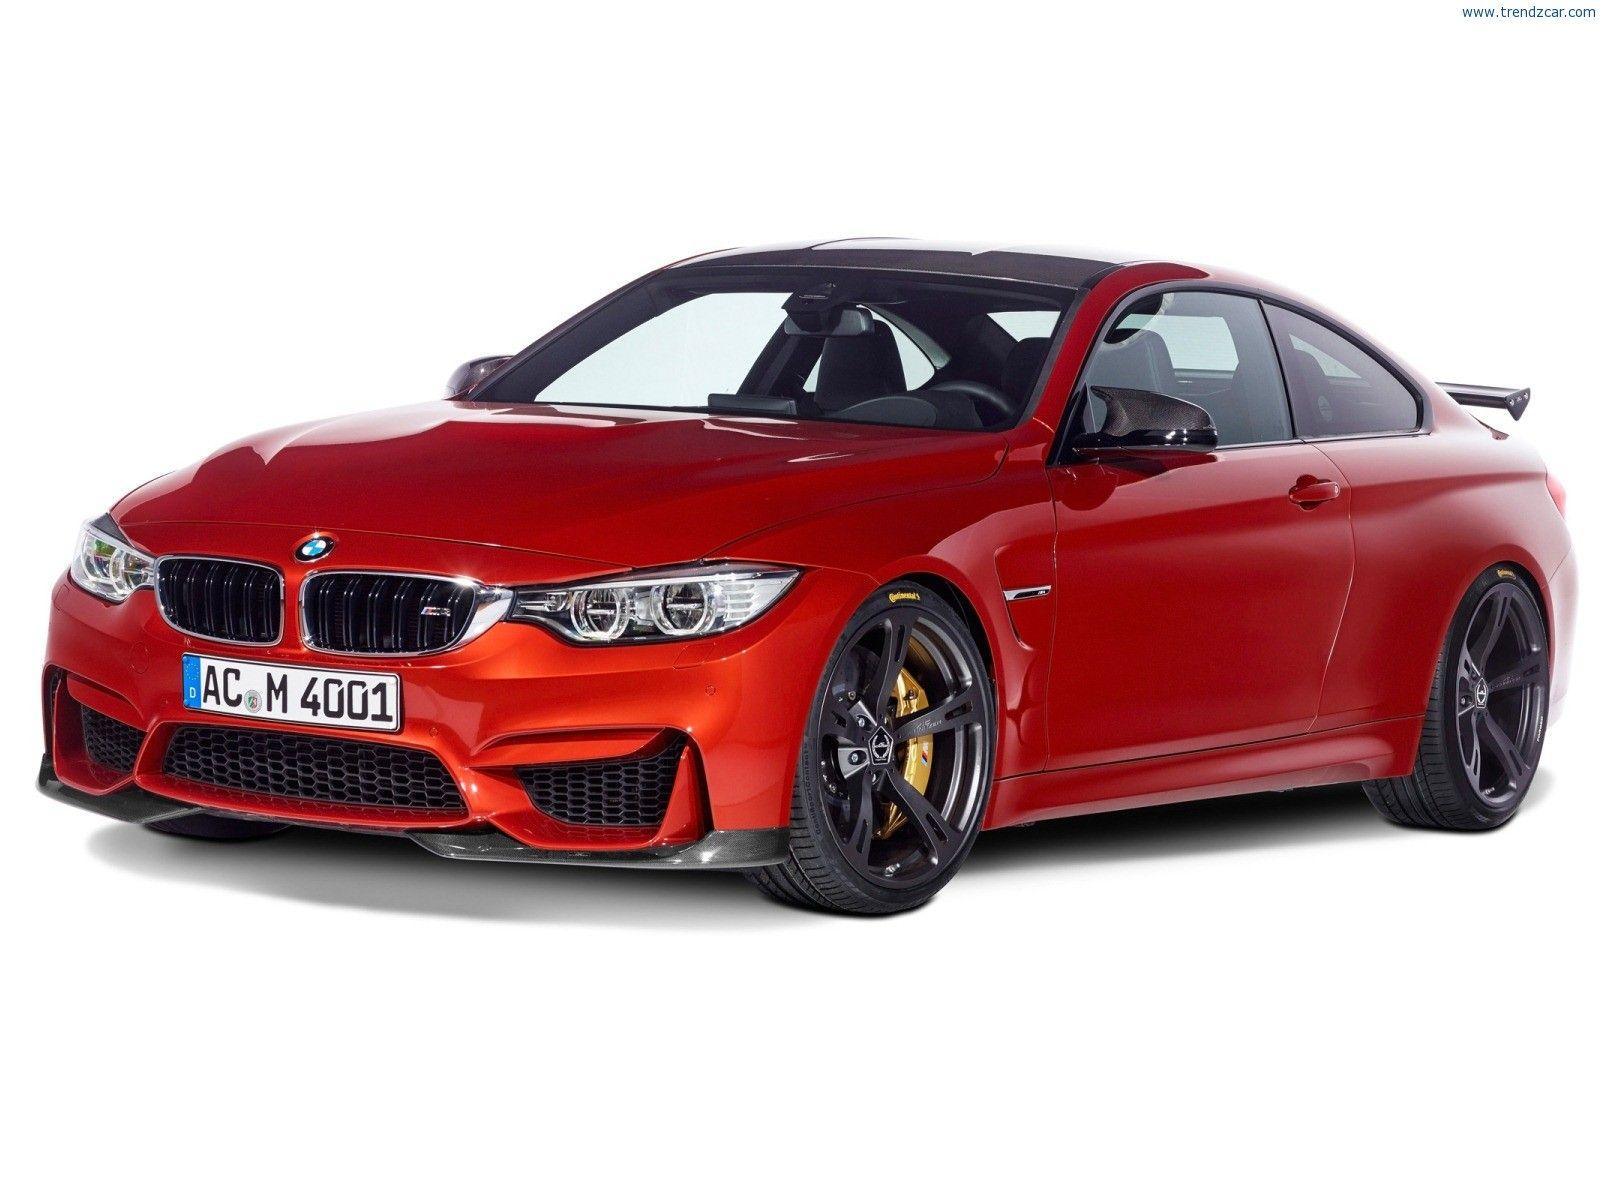 2014 AC Schnitzer BMW M4 x Cars Pinterest